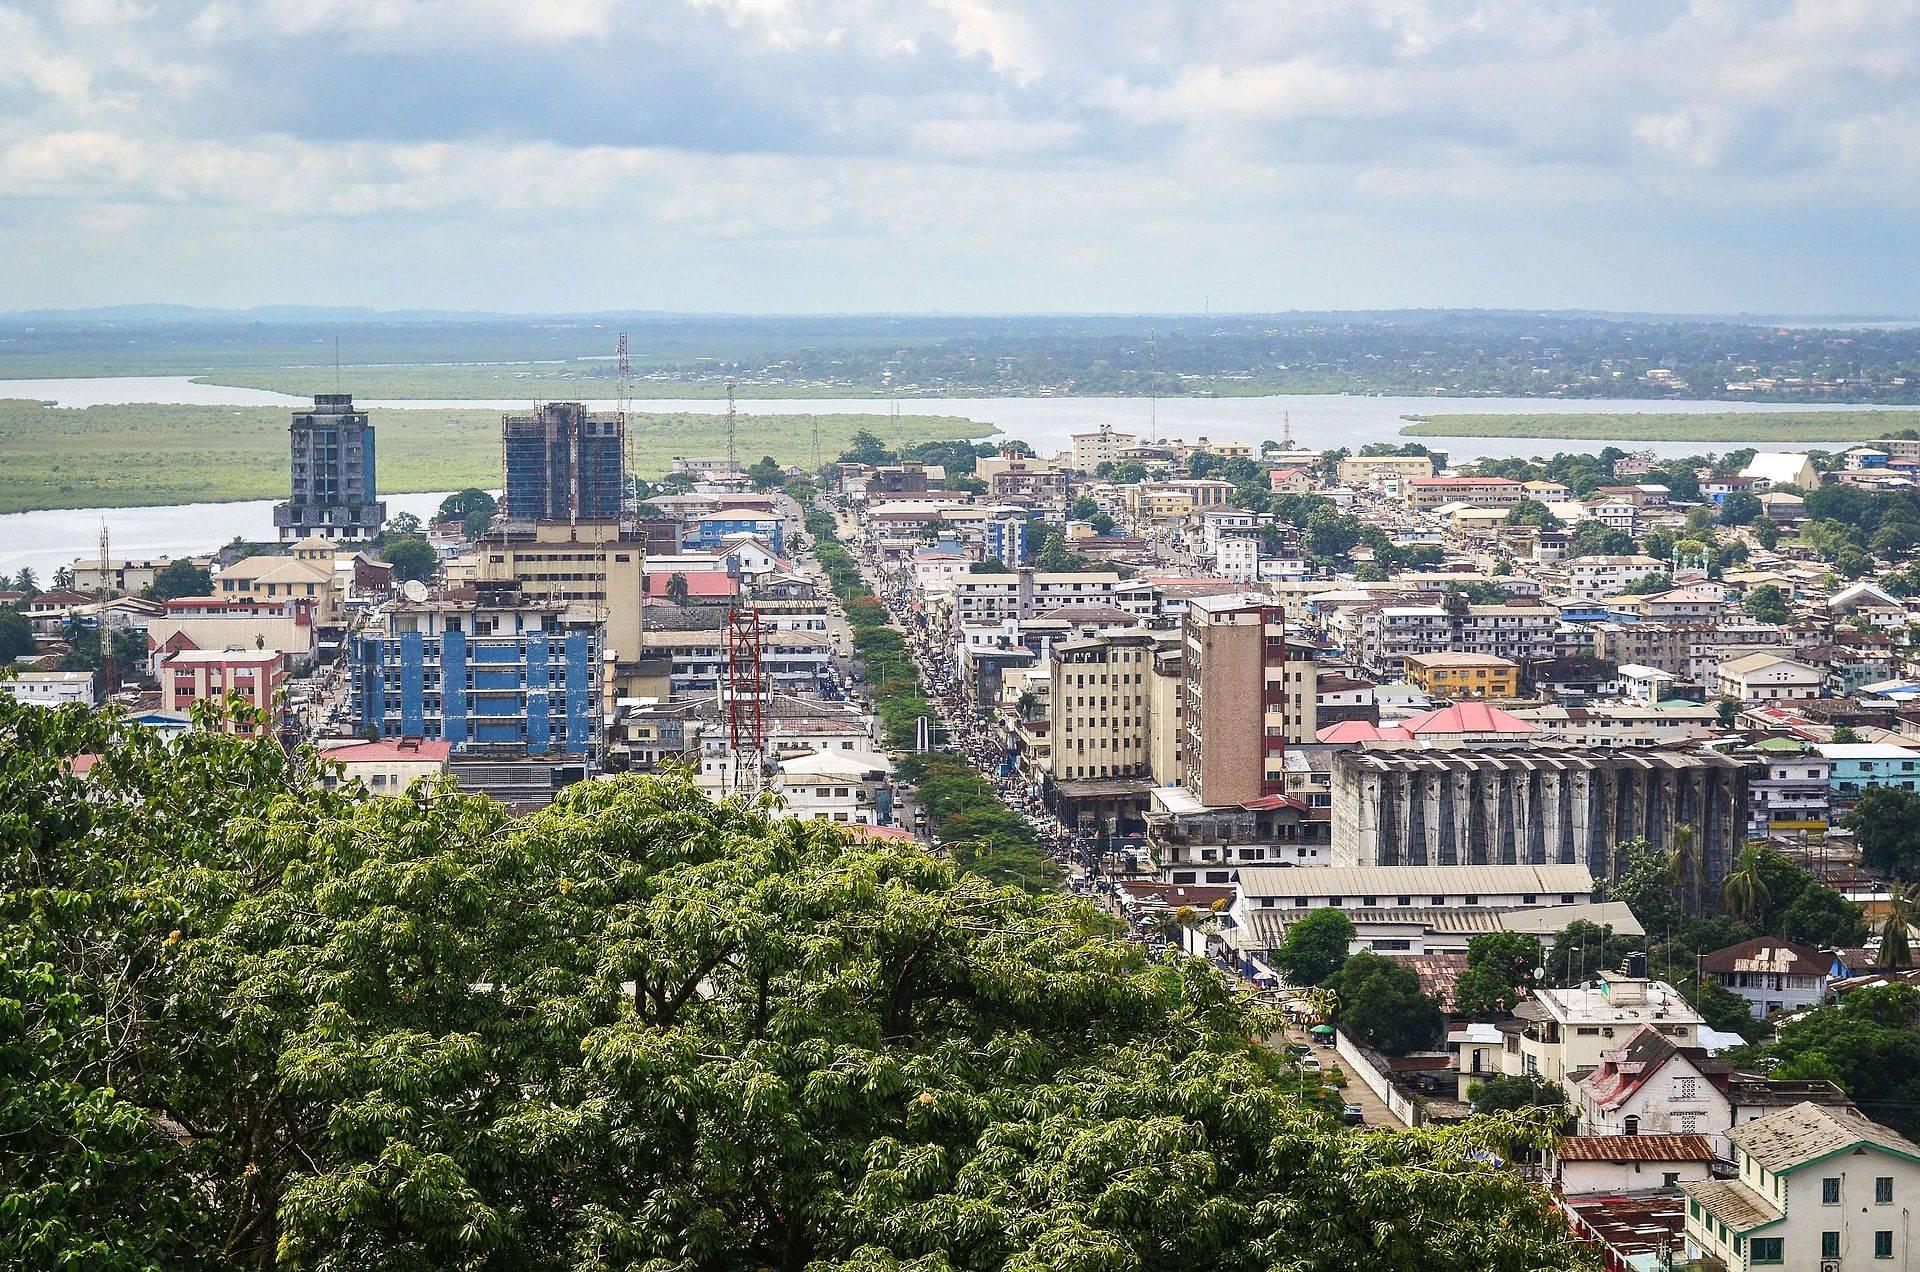 Monróvia, capital da Libéria. Foto: Wikimedia Commons.